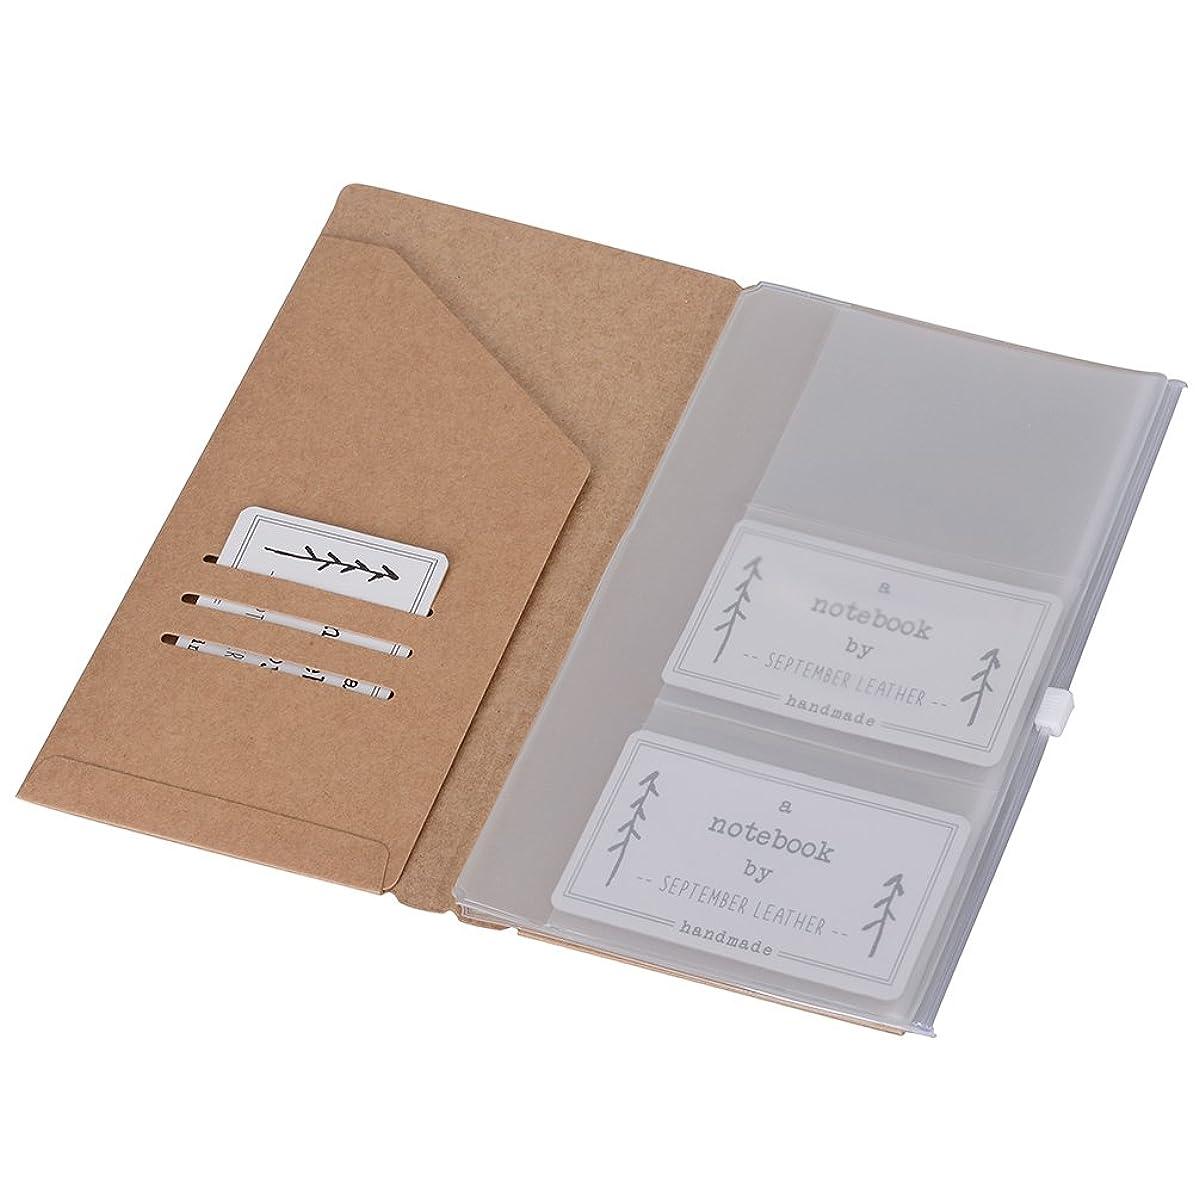 Kraft File Folder + Zipper Pouch & Card Sleeve Travel Accessories Pack - Refills for Standard Size Travelers Notebook